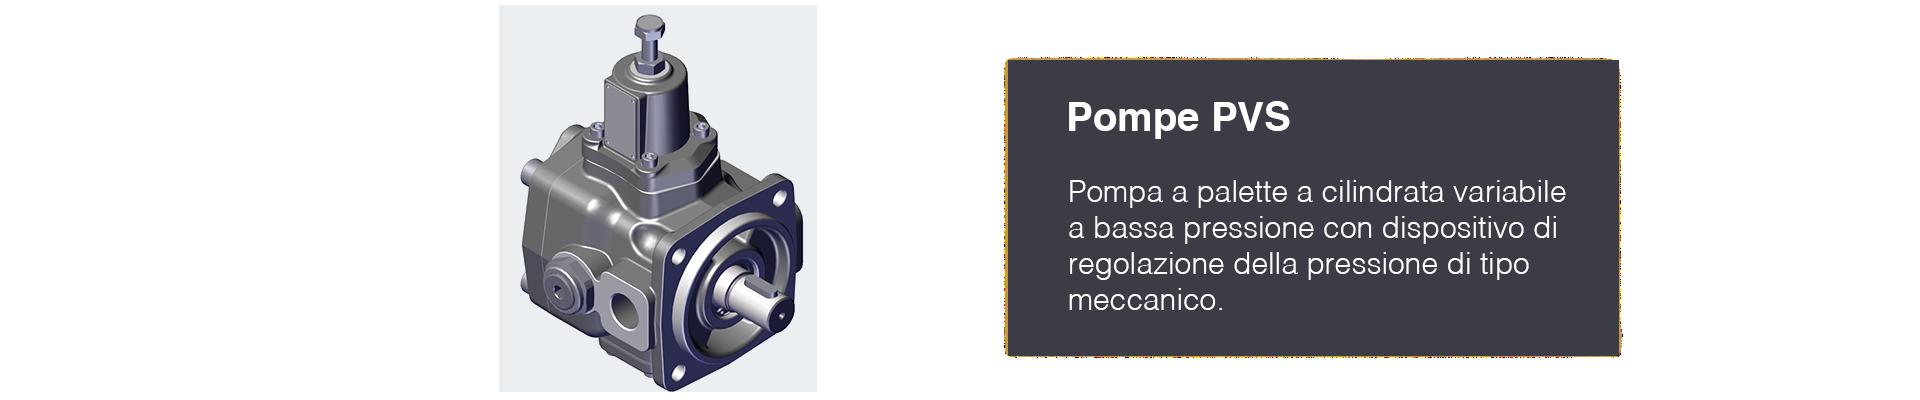 pompe_pvs_top